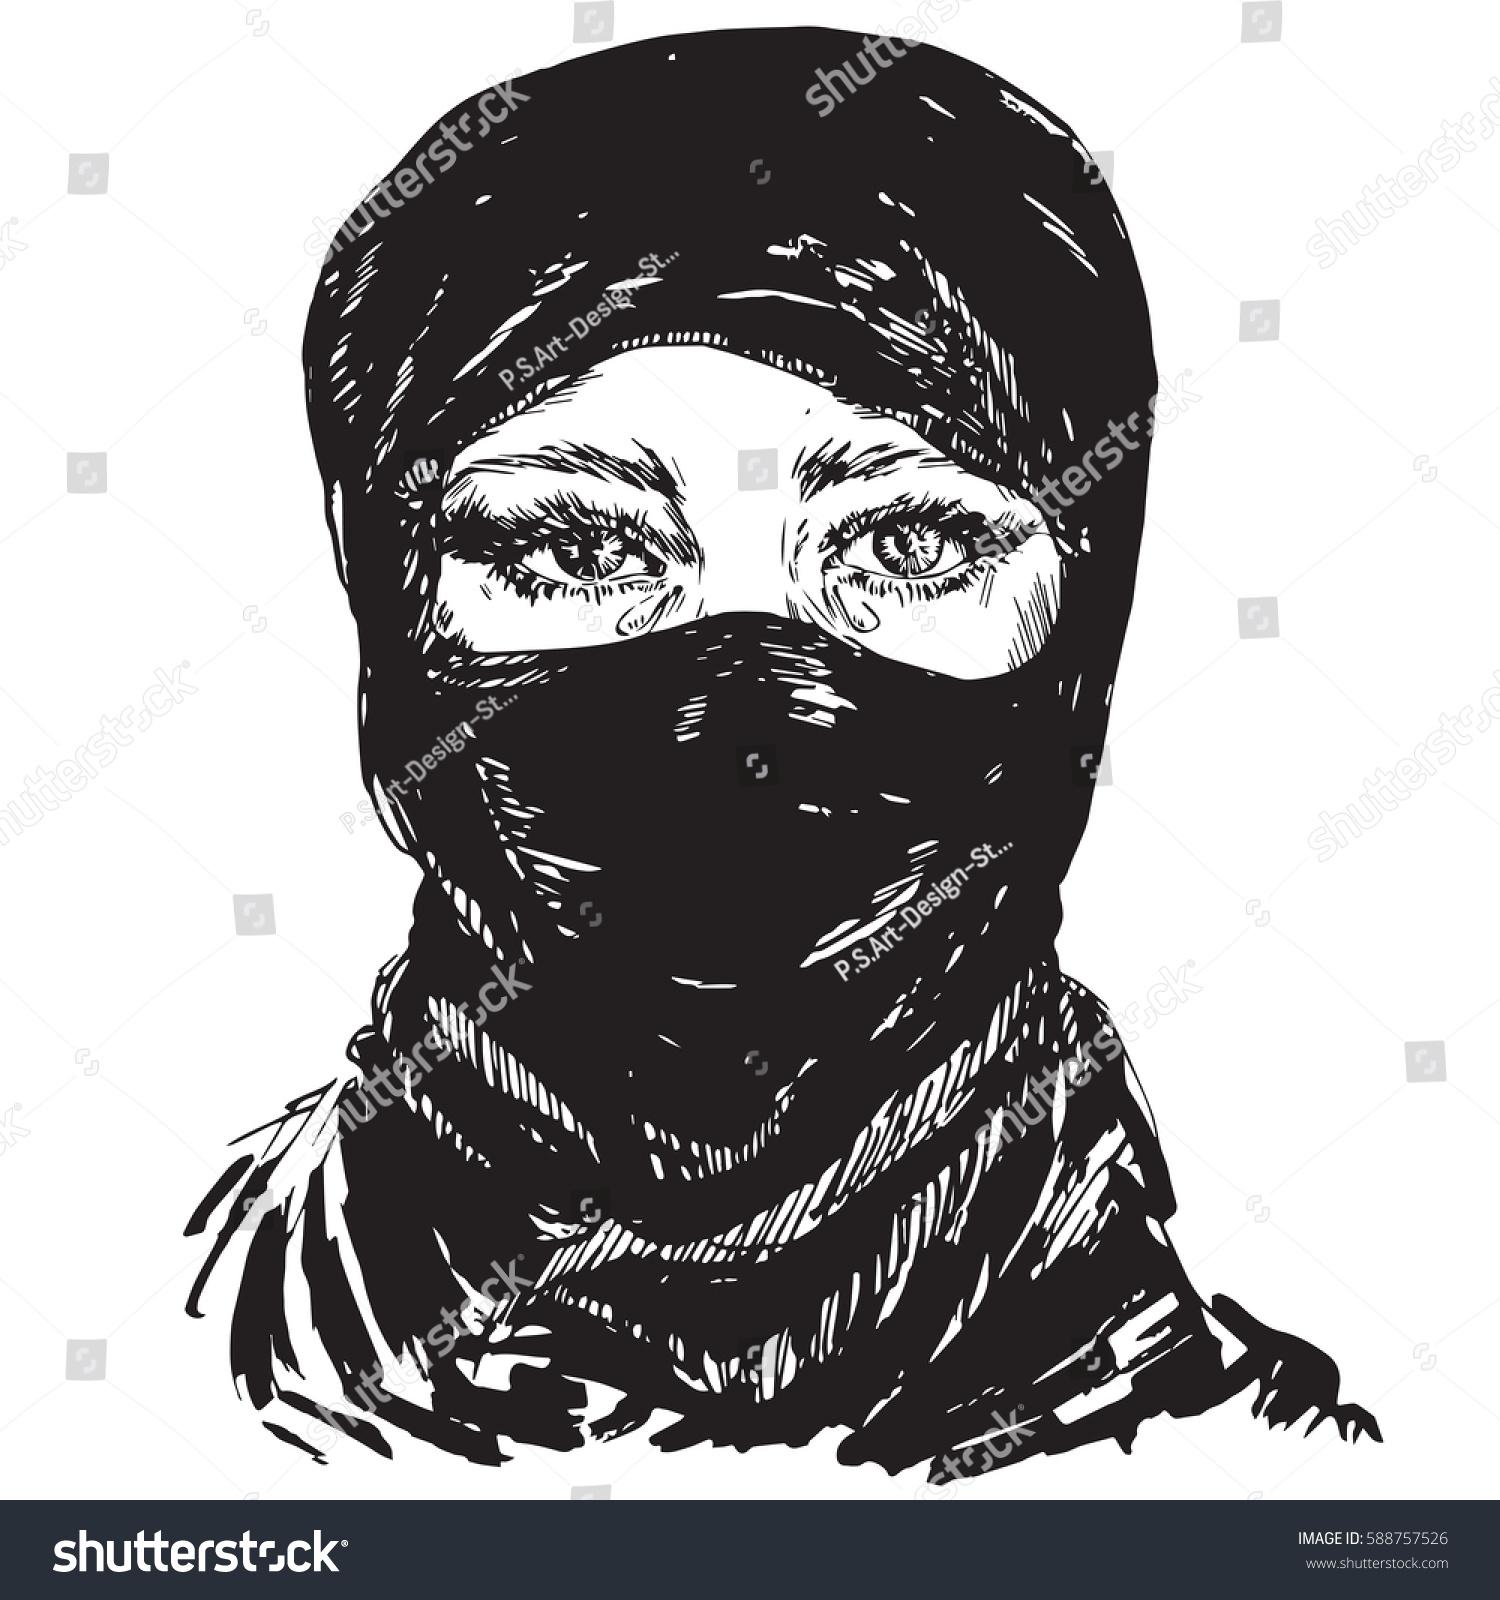 The beautiful muslim girl crying face hidden in a black headscarf hijab